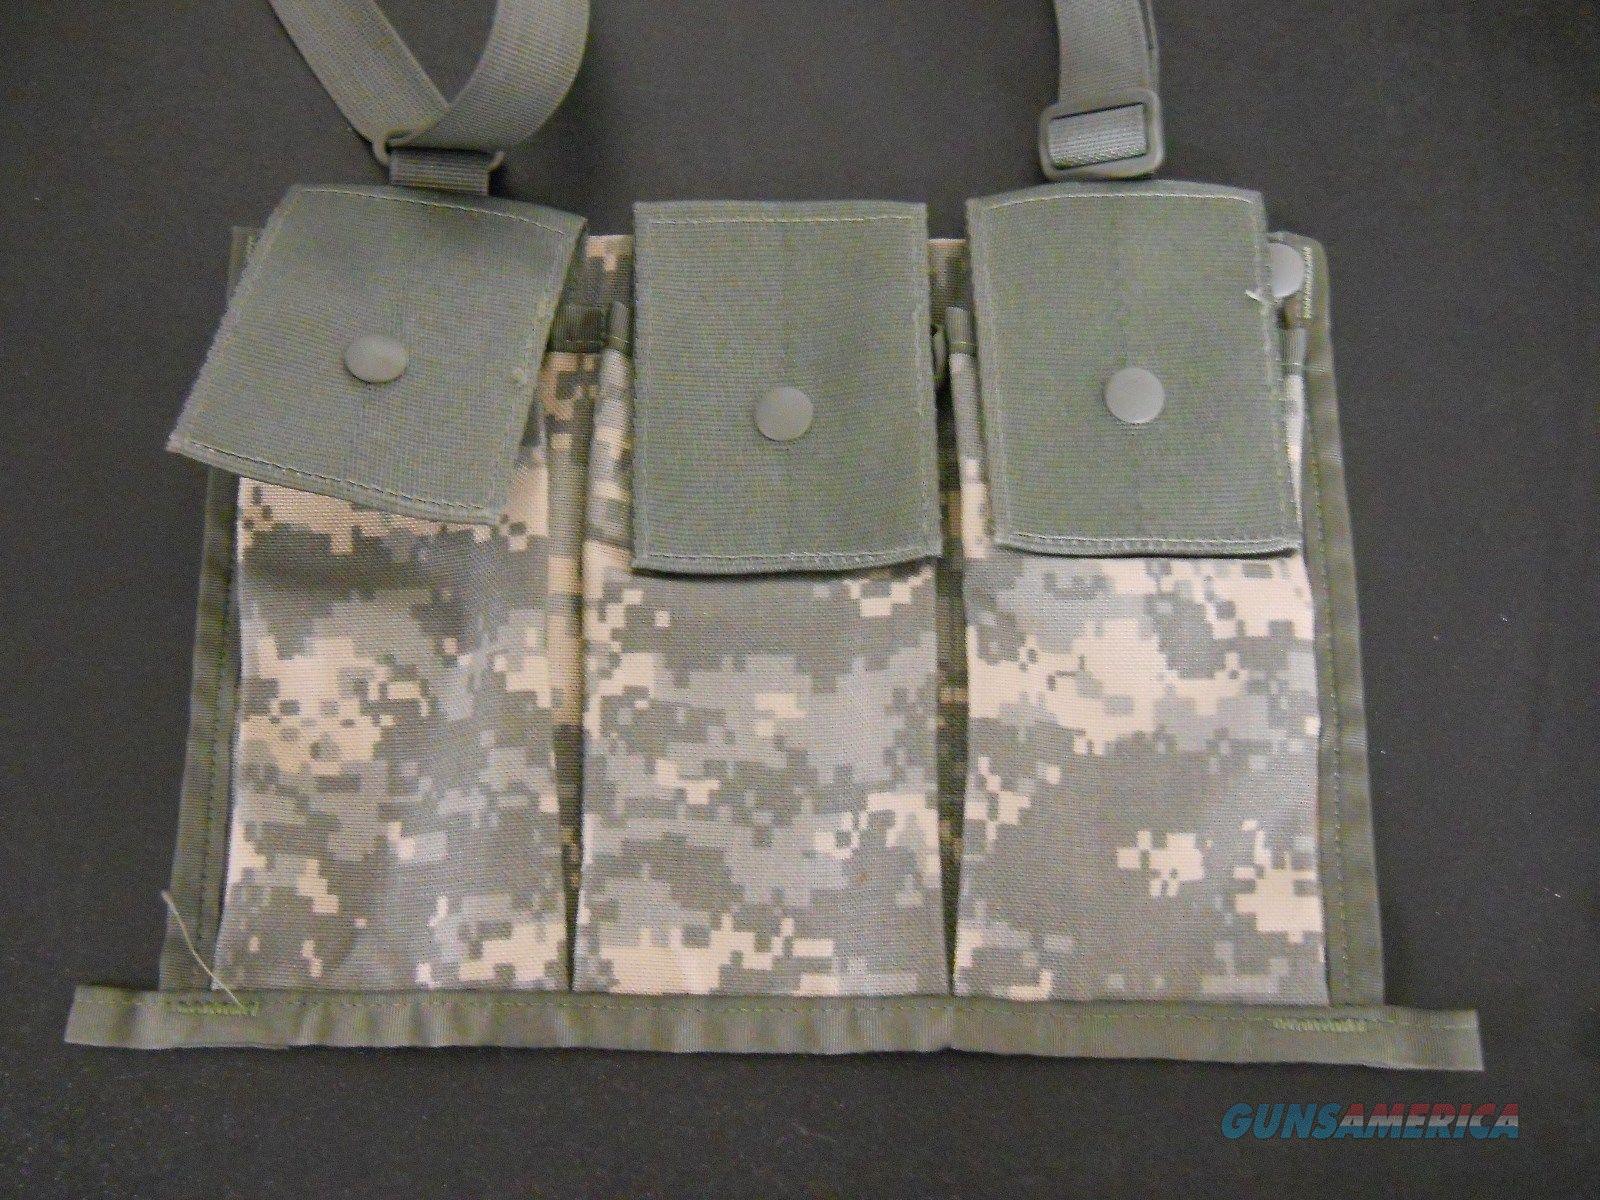 6 Each ACU DIGITAL MOLLE II BANDOLEER AMMUNITION POUCHES, 6 MAGAZINE, NEW w/Strap  Non-Guns > Magazines & Clips > Rifle Magazines > AR-15 Type